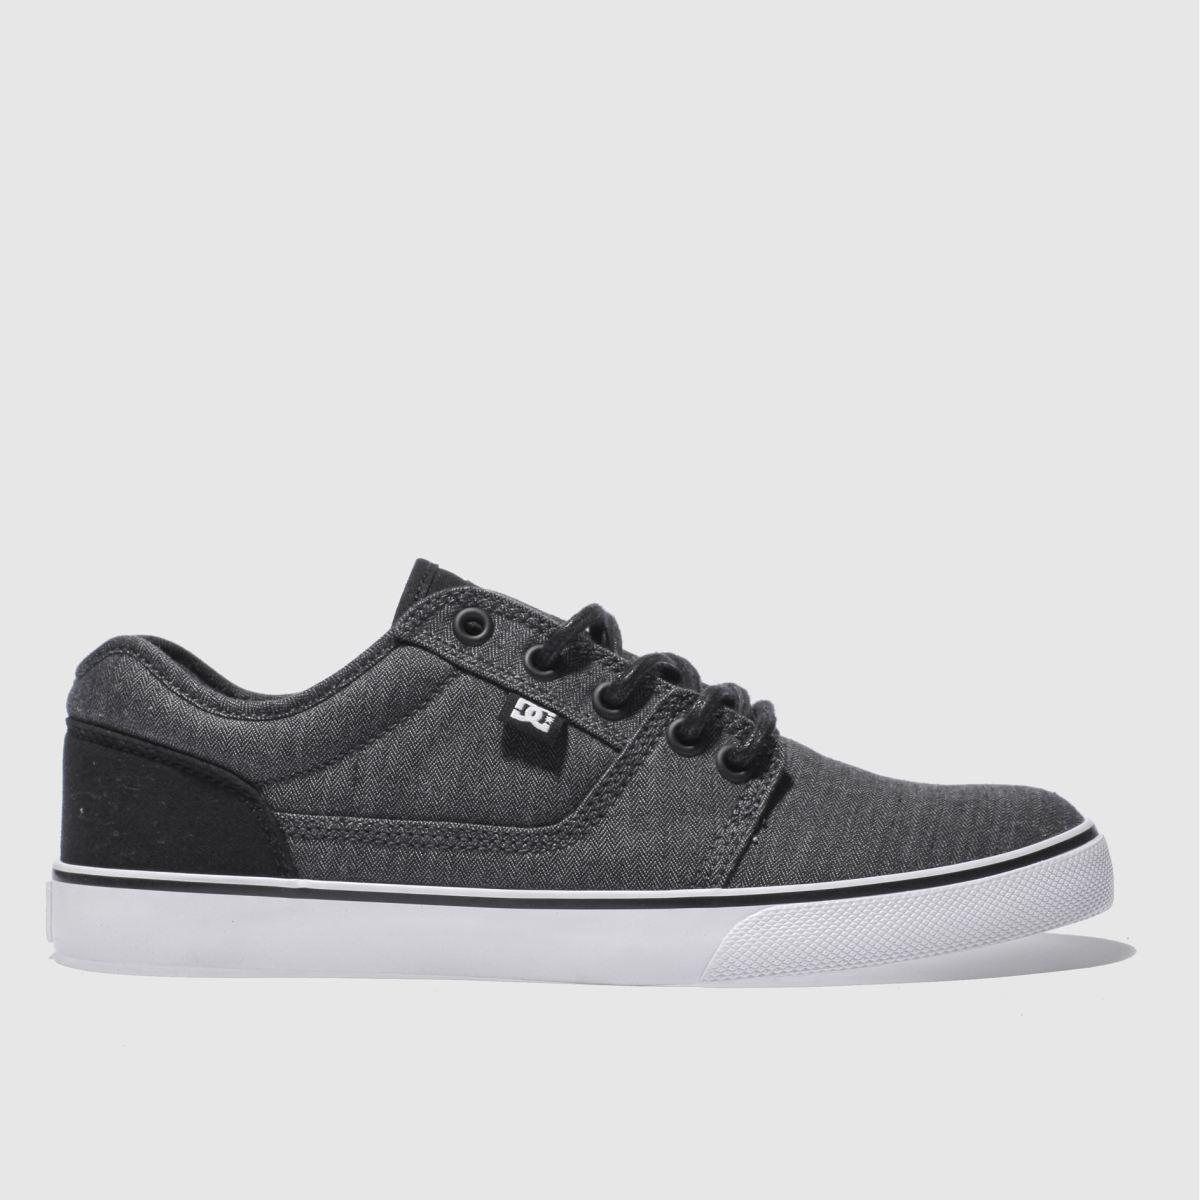 dc shoes Dc Shoes Dark Grey Tonik Trainers